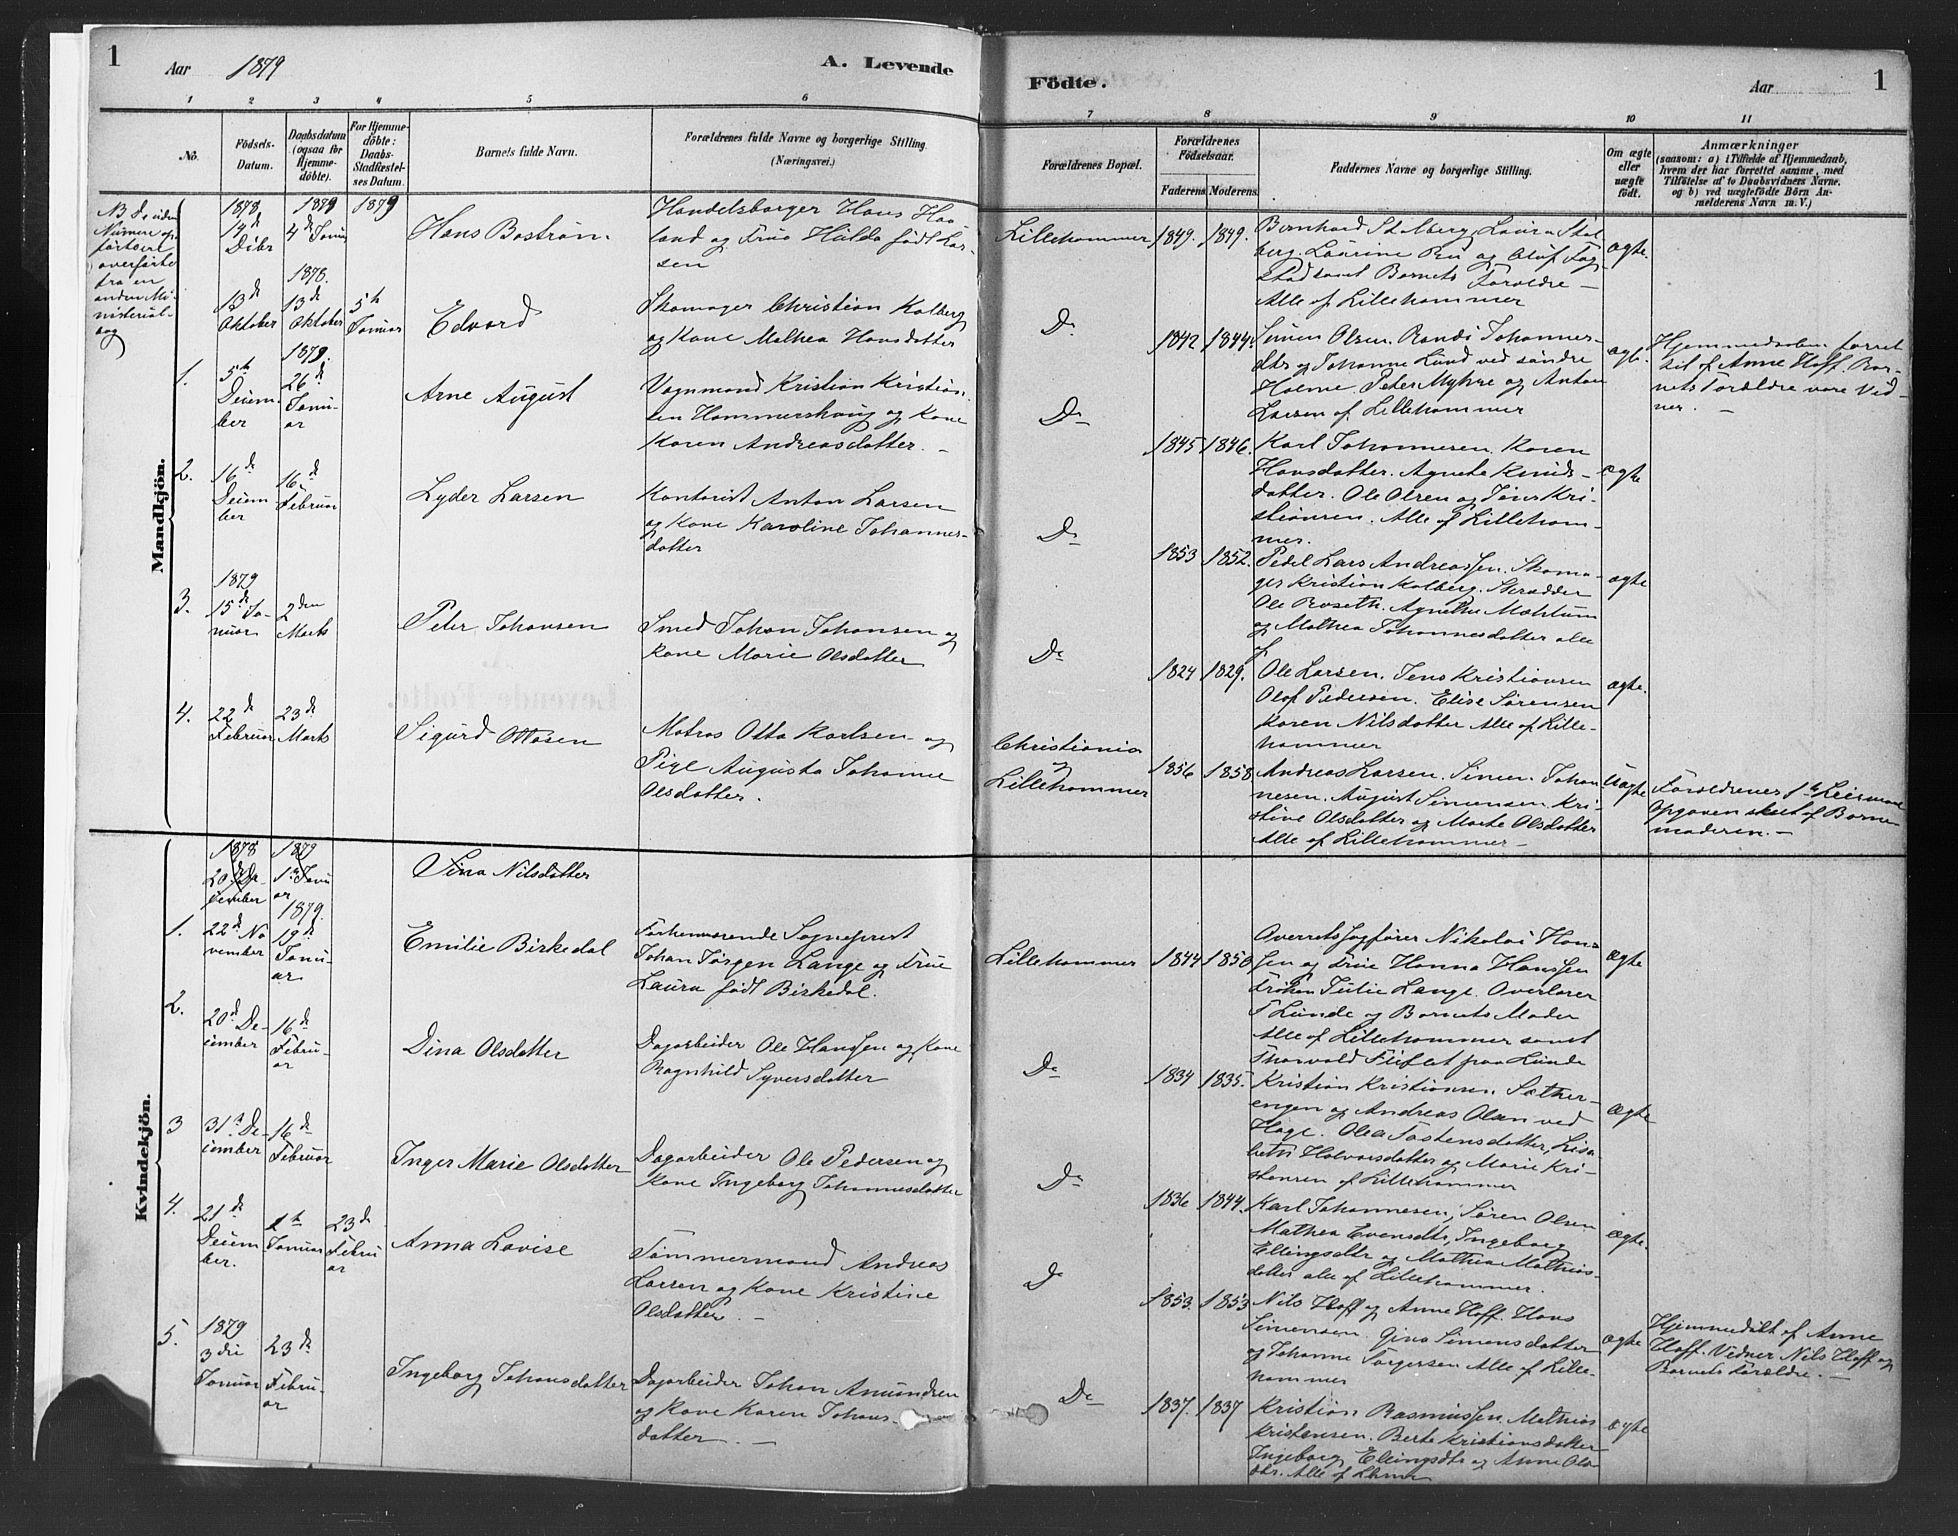 SAH, Fåberg prestekontor, H/Ha/Haa/L0010: Ministerialbok nr. 10, 1879-1900, s. 1